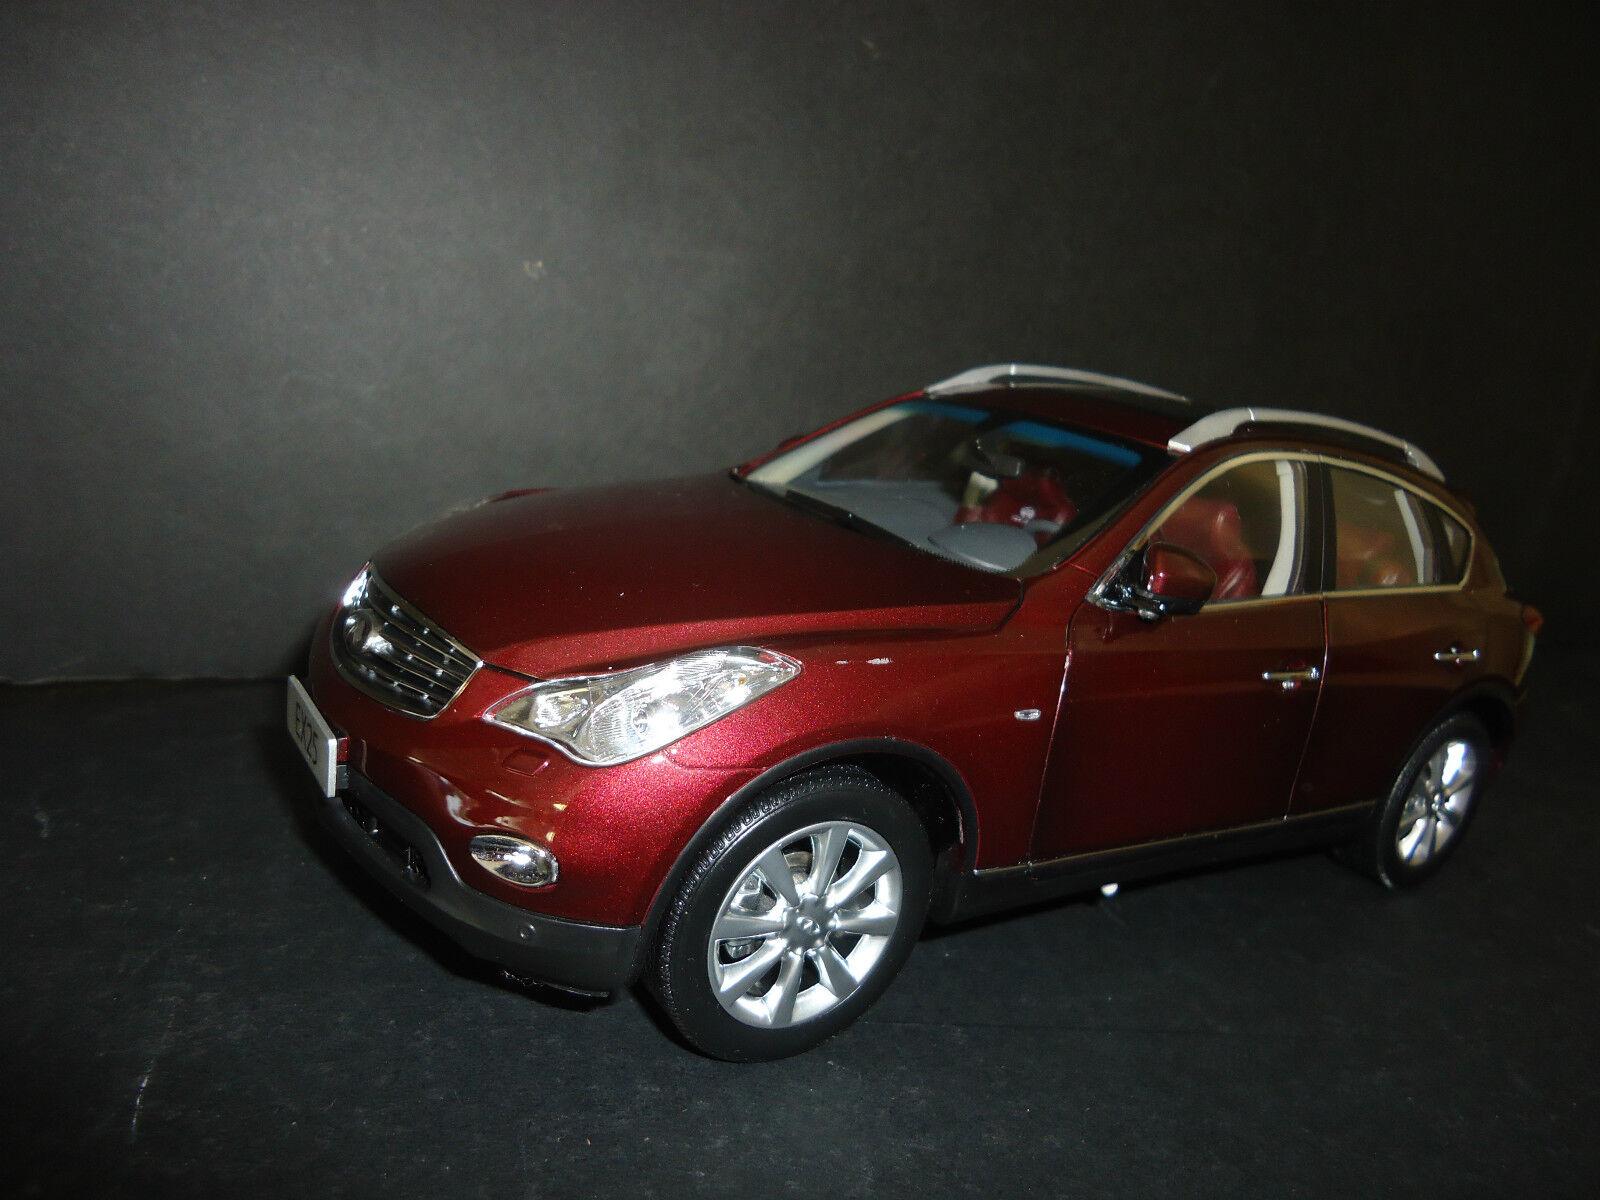 Paudi Infiniti EX25 2012 Burgundy rot 1 18 hoch Quality Modell